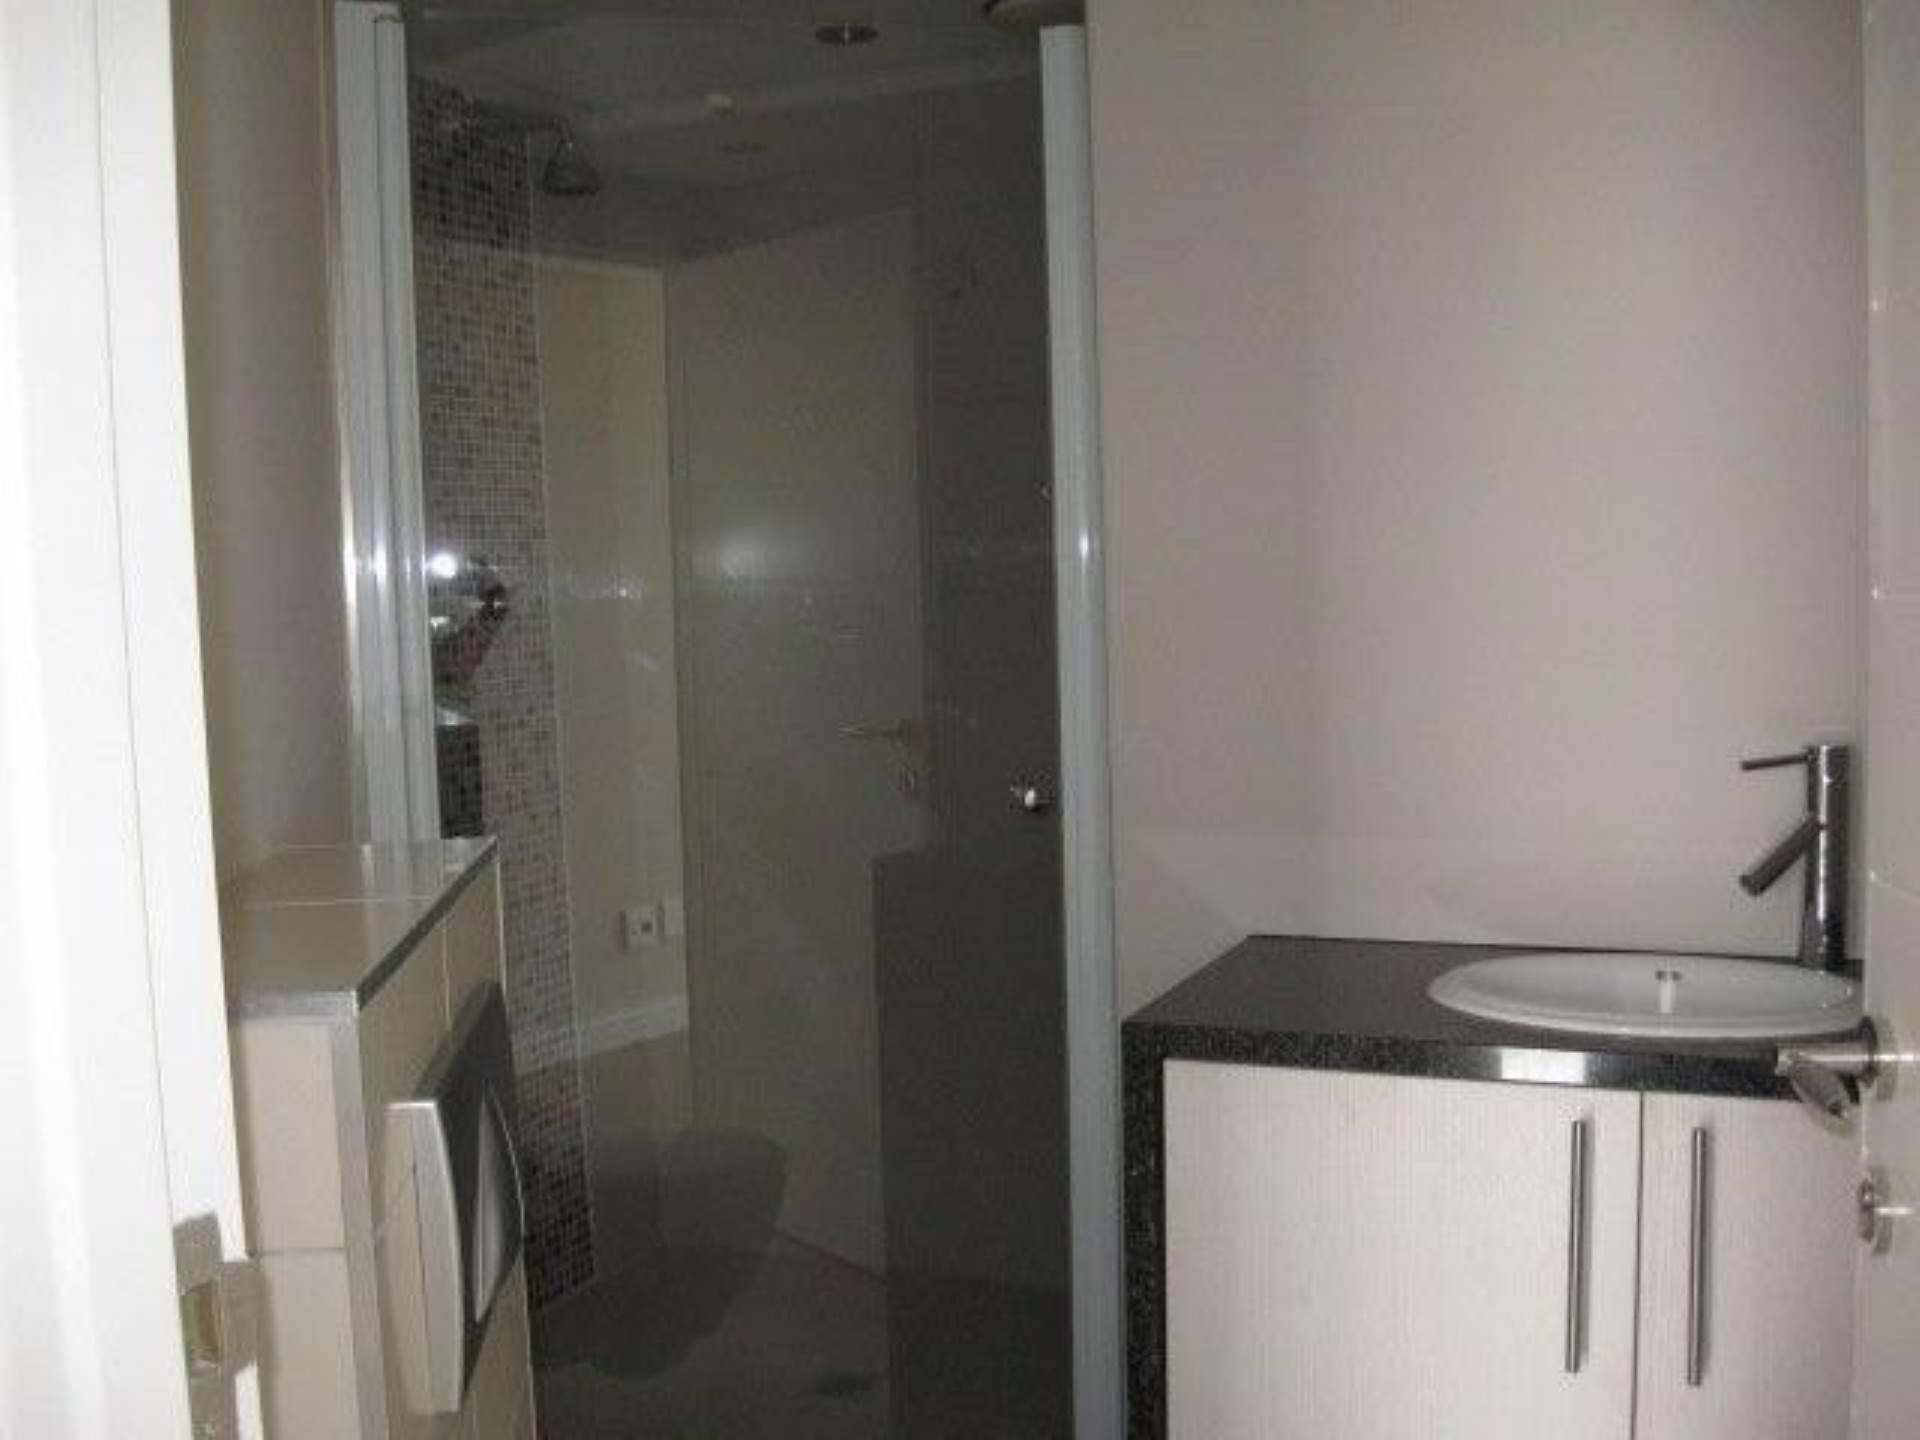 De Waterkant property for sale. Ref No: 13475436. Picture no 5